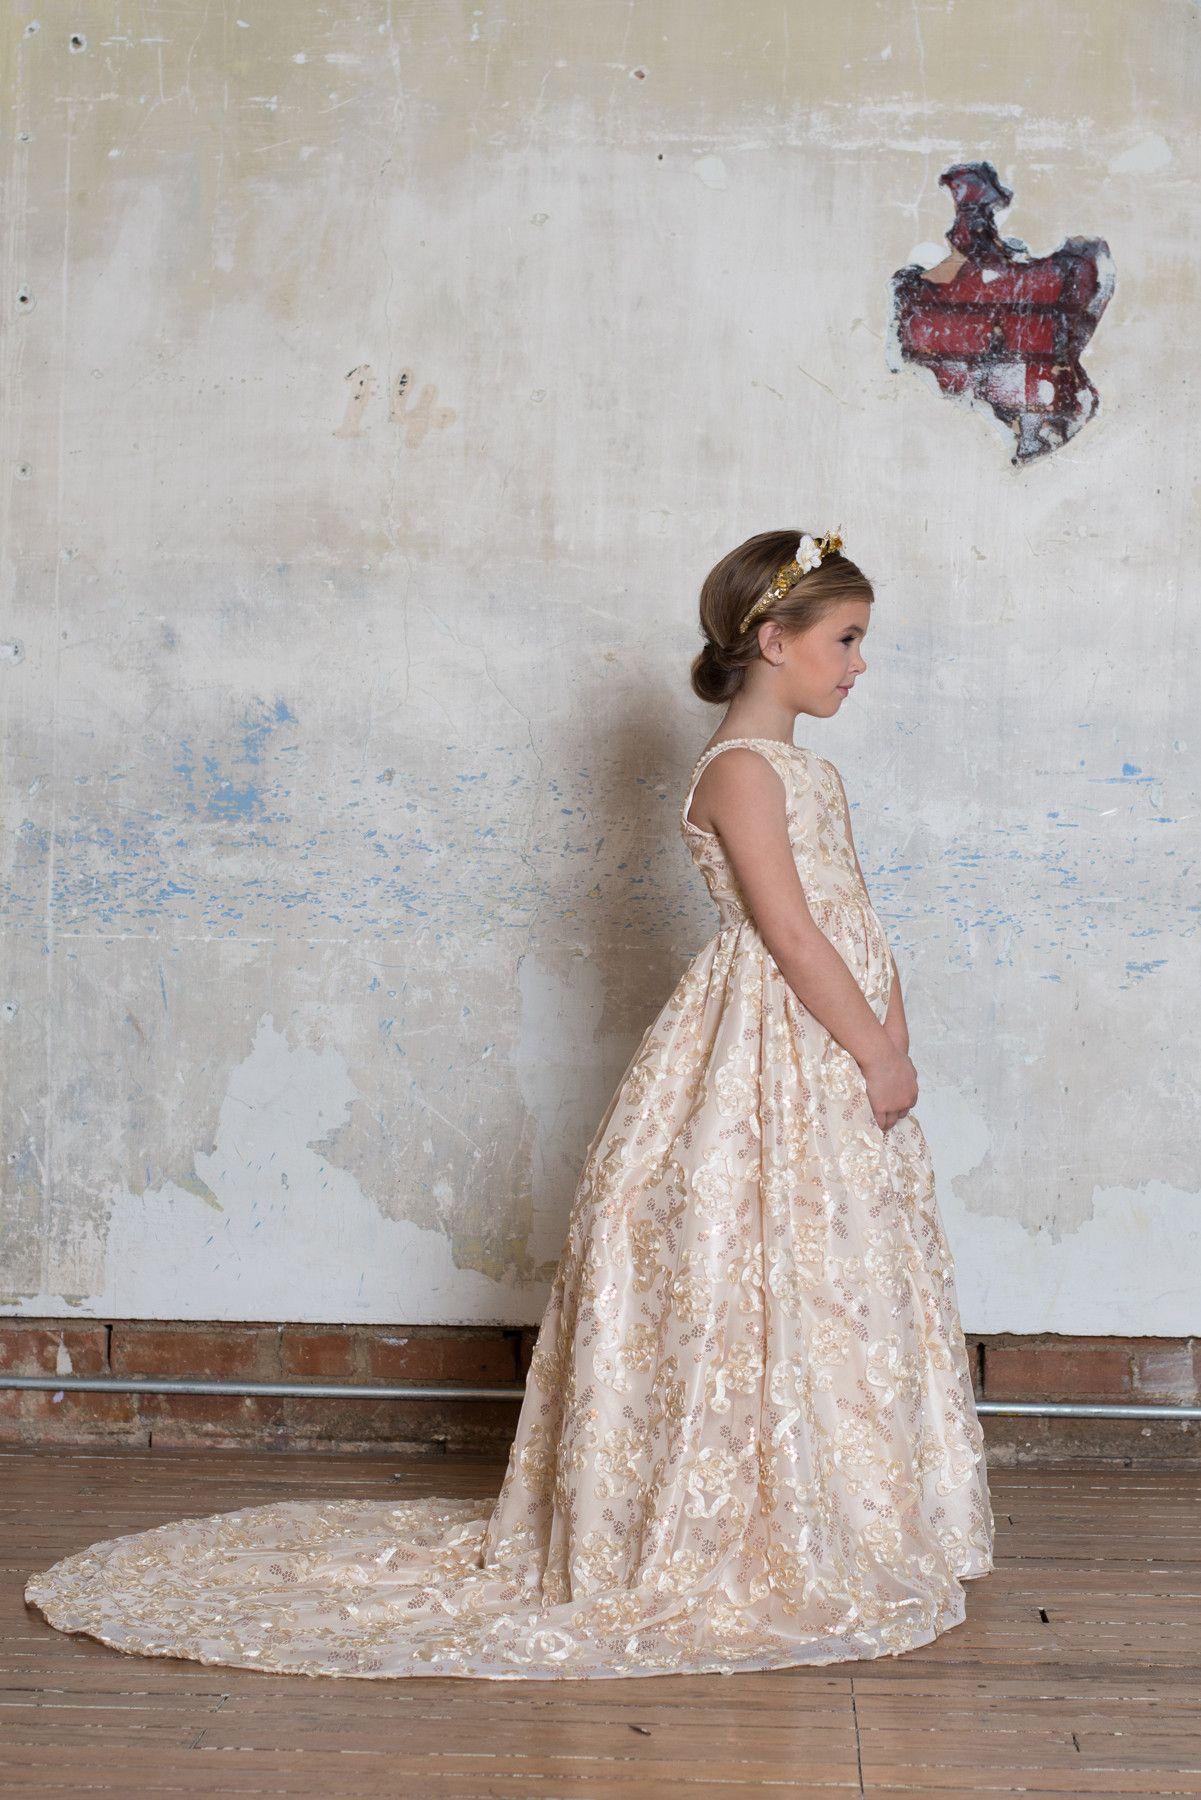 Champagne train gown by Loren Franco Designs